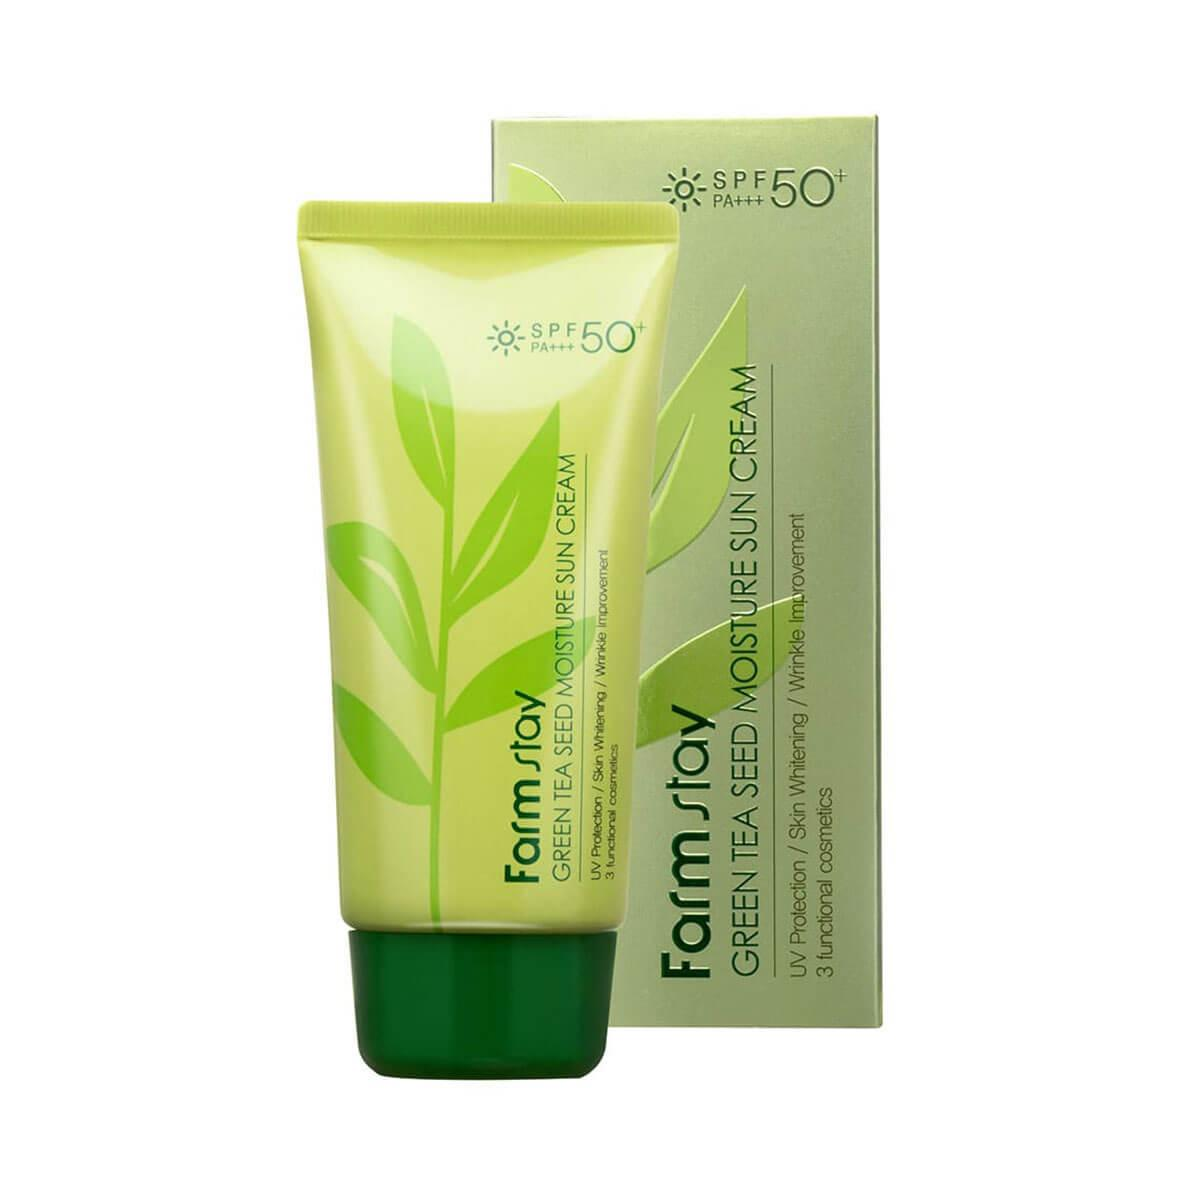 FarmStay Green Tea Seed Moisture Sun Cream SPF50 Солнцезащитный крем с зеленым чаем, 70 г